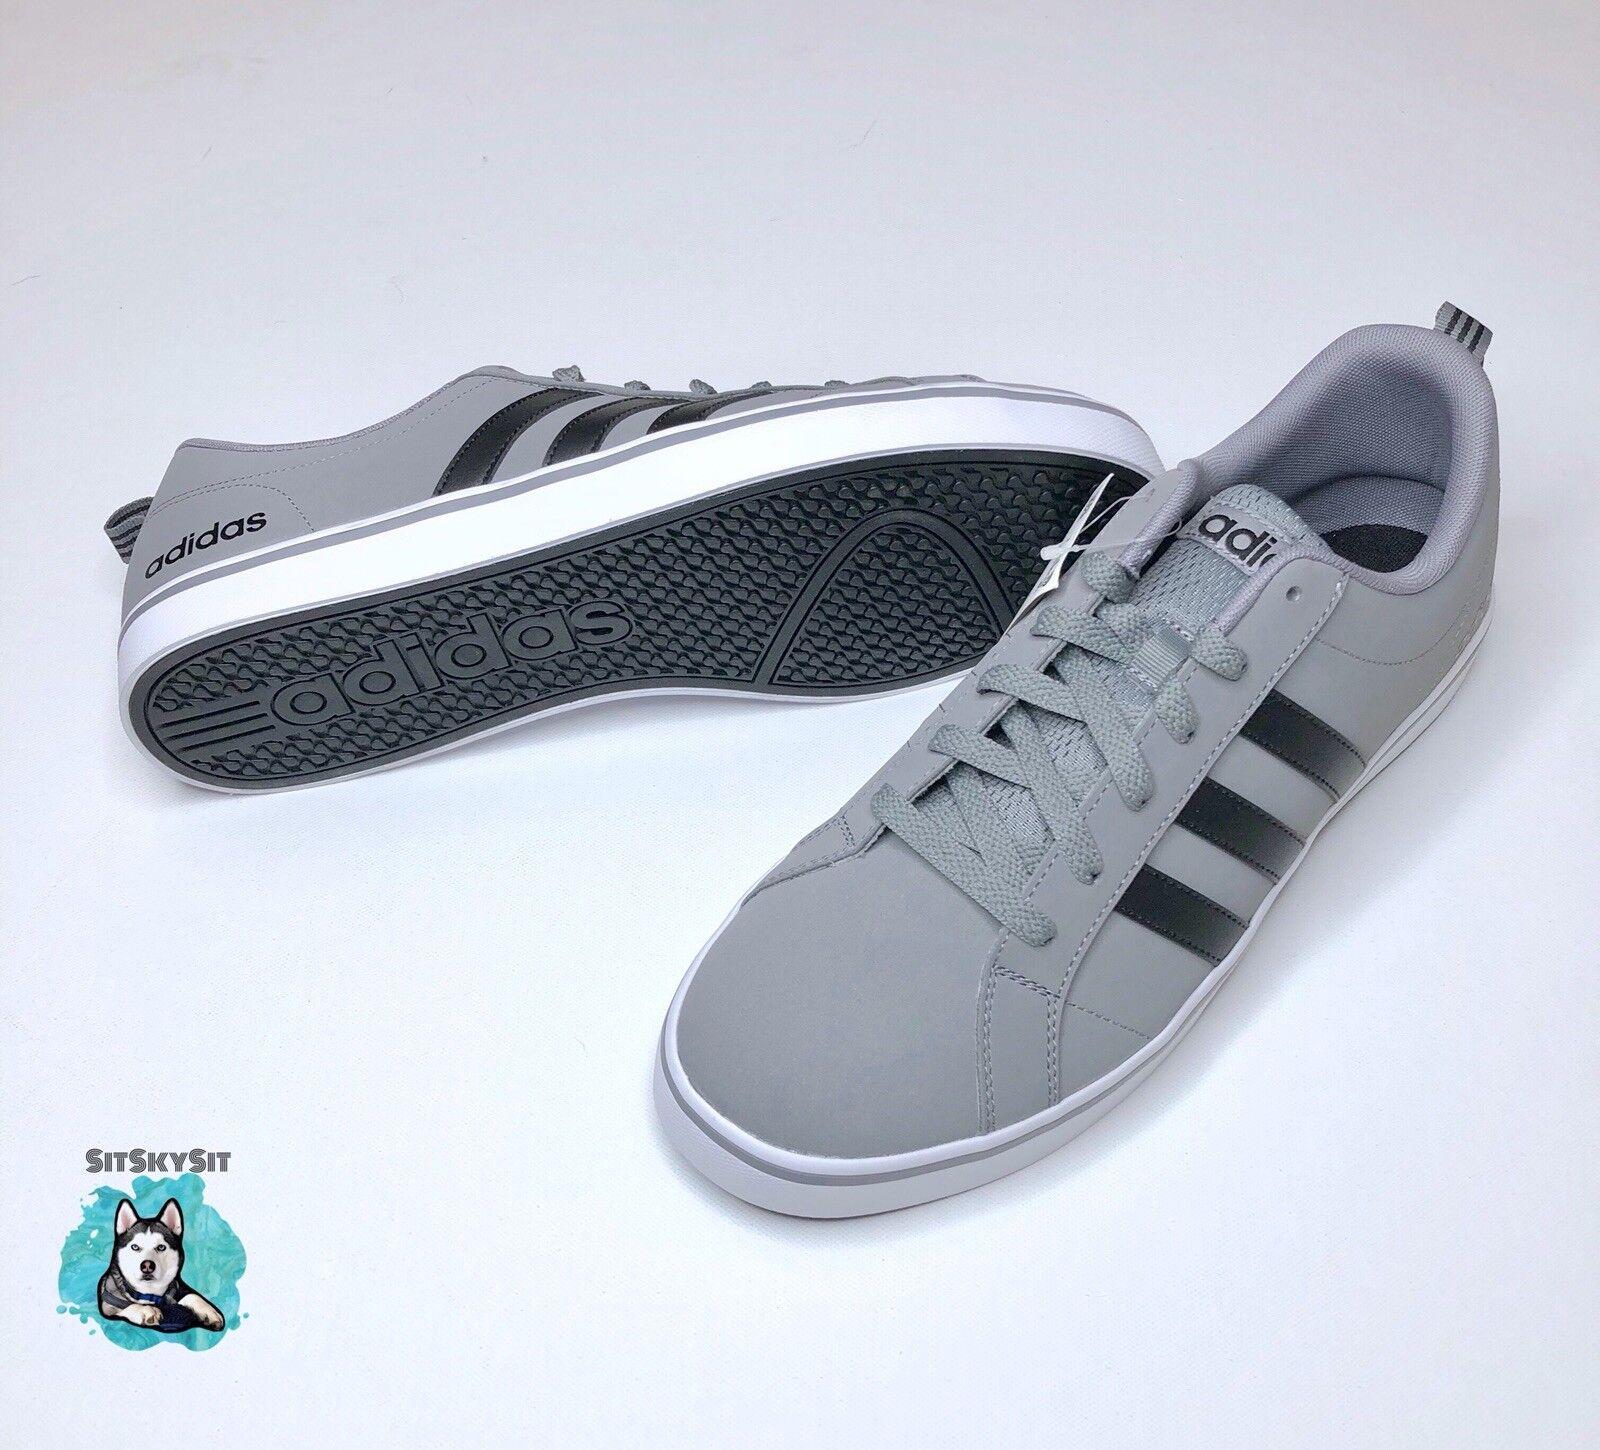 Adidas schwarz vs. tempo basketball - grau - schwarz Adidas b74318 männer größe 10,5 49d544